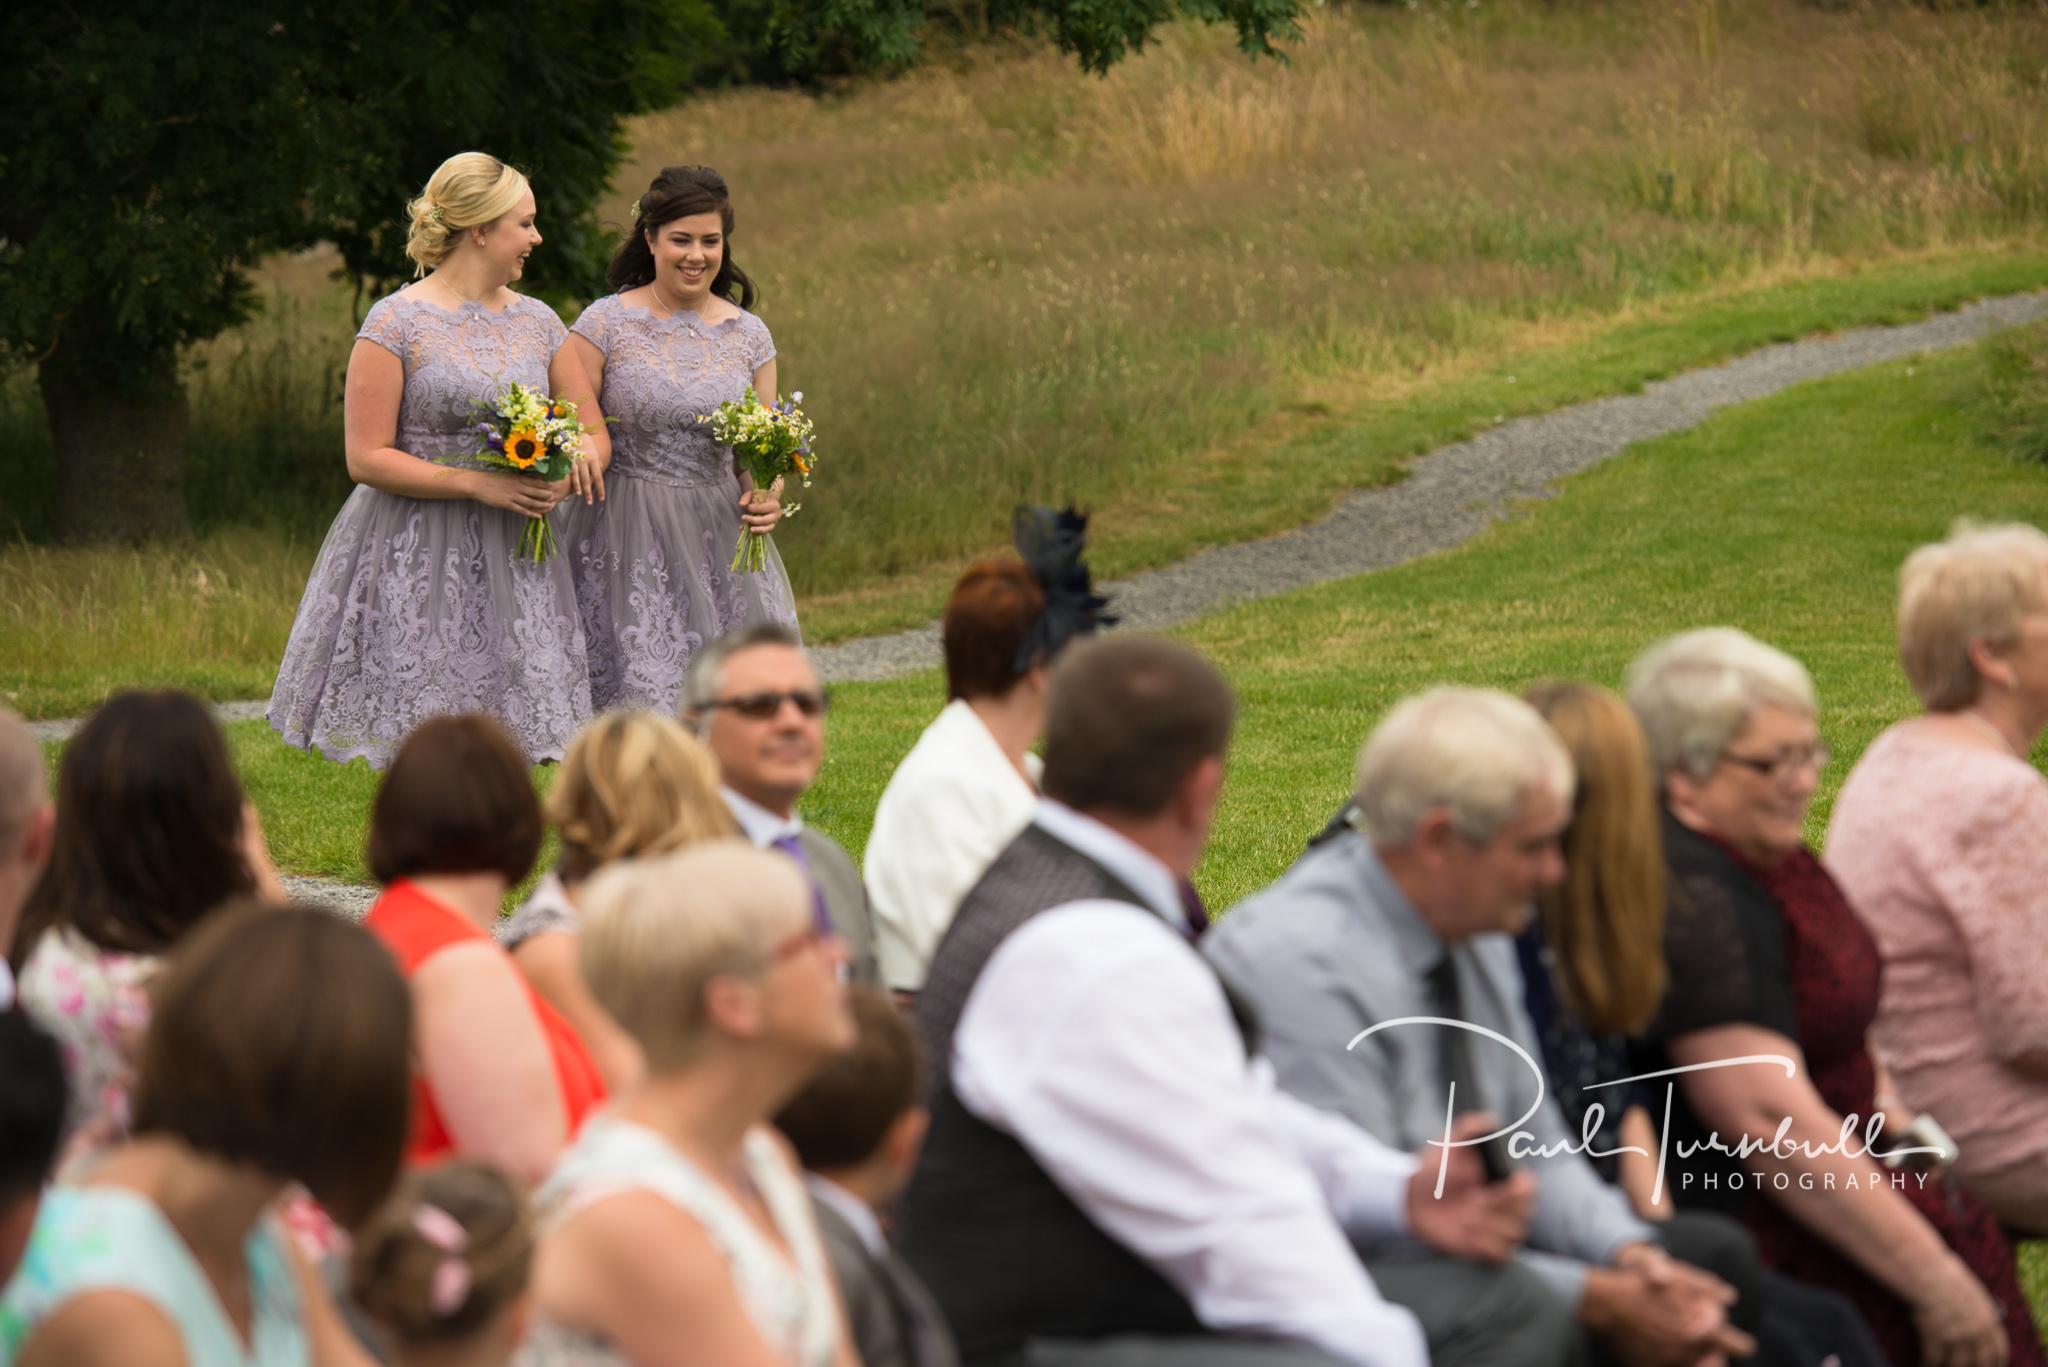 wedding-photographer-hilltop-farm-ilton-yorkshire-009.jpg